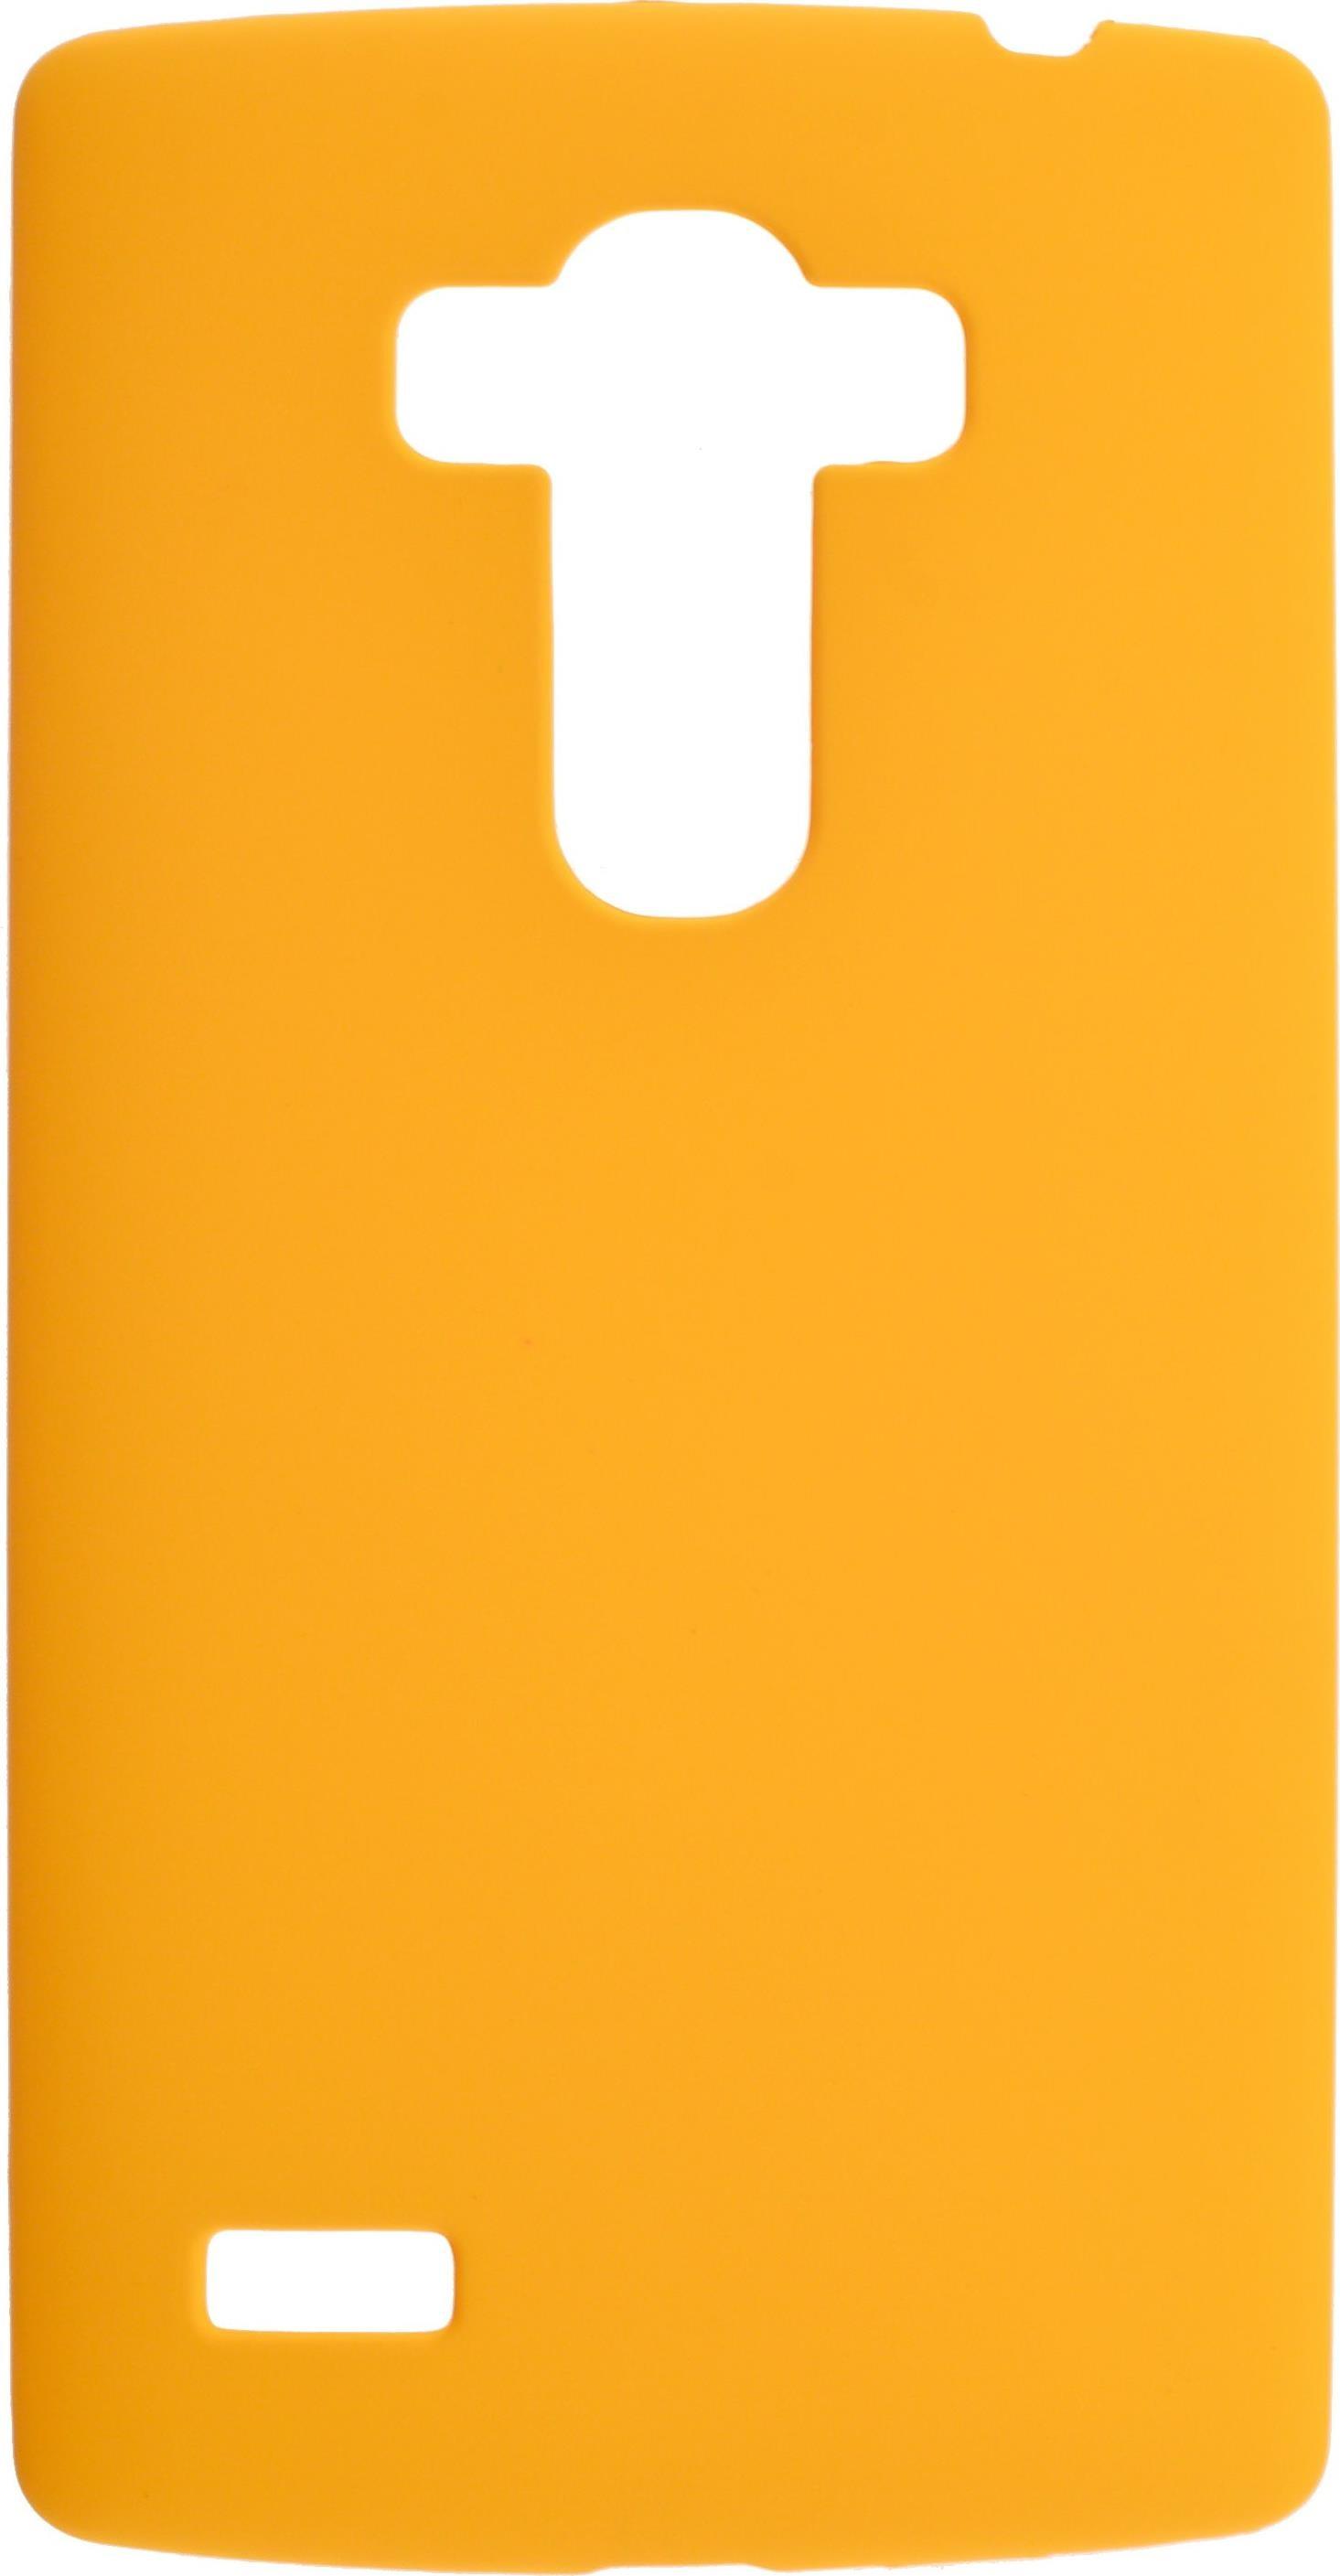 Накладка skinBOX для LG G4S, 2000000079233, желтый